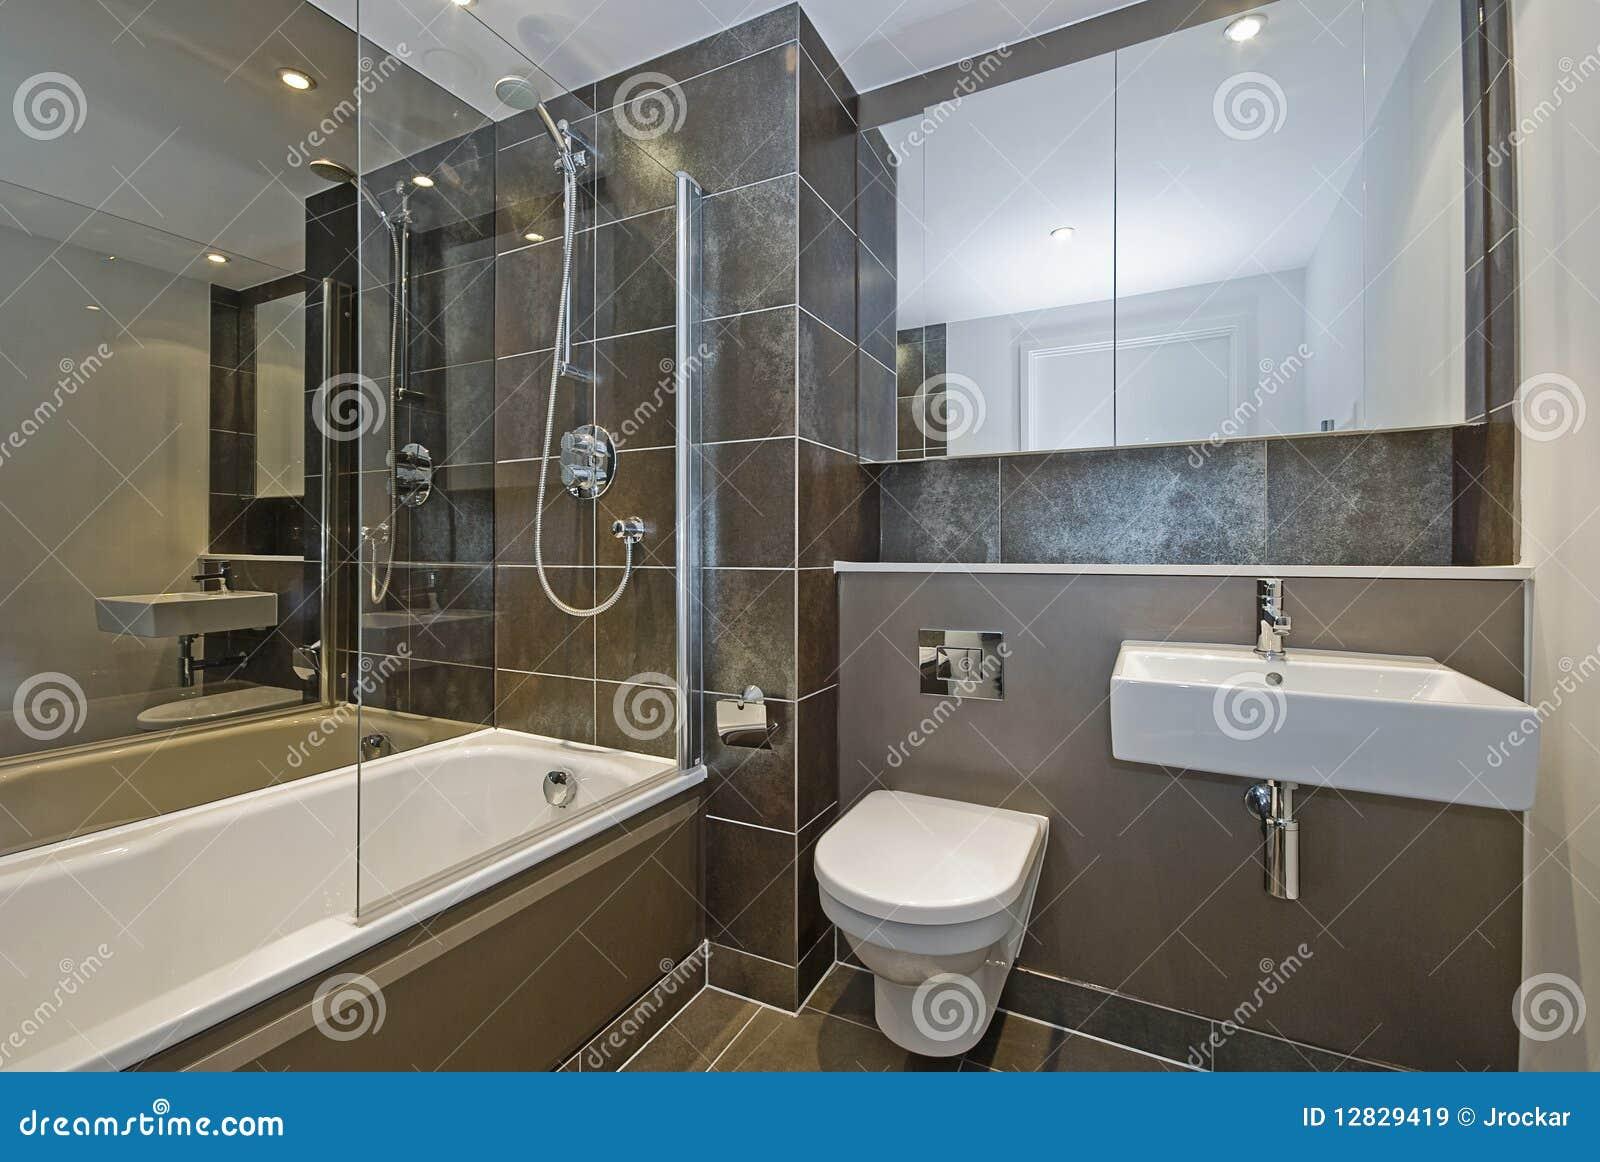 Salle de bains de luxe image stock image du propri t for Salle de bain orientale luxe